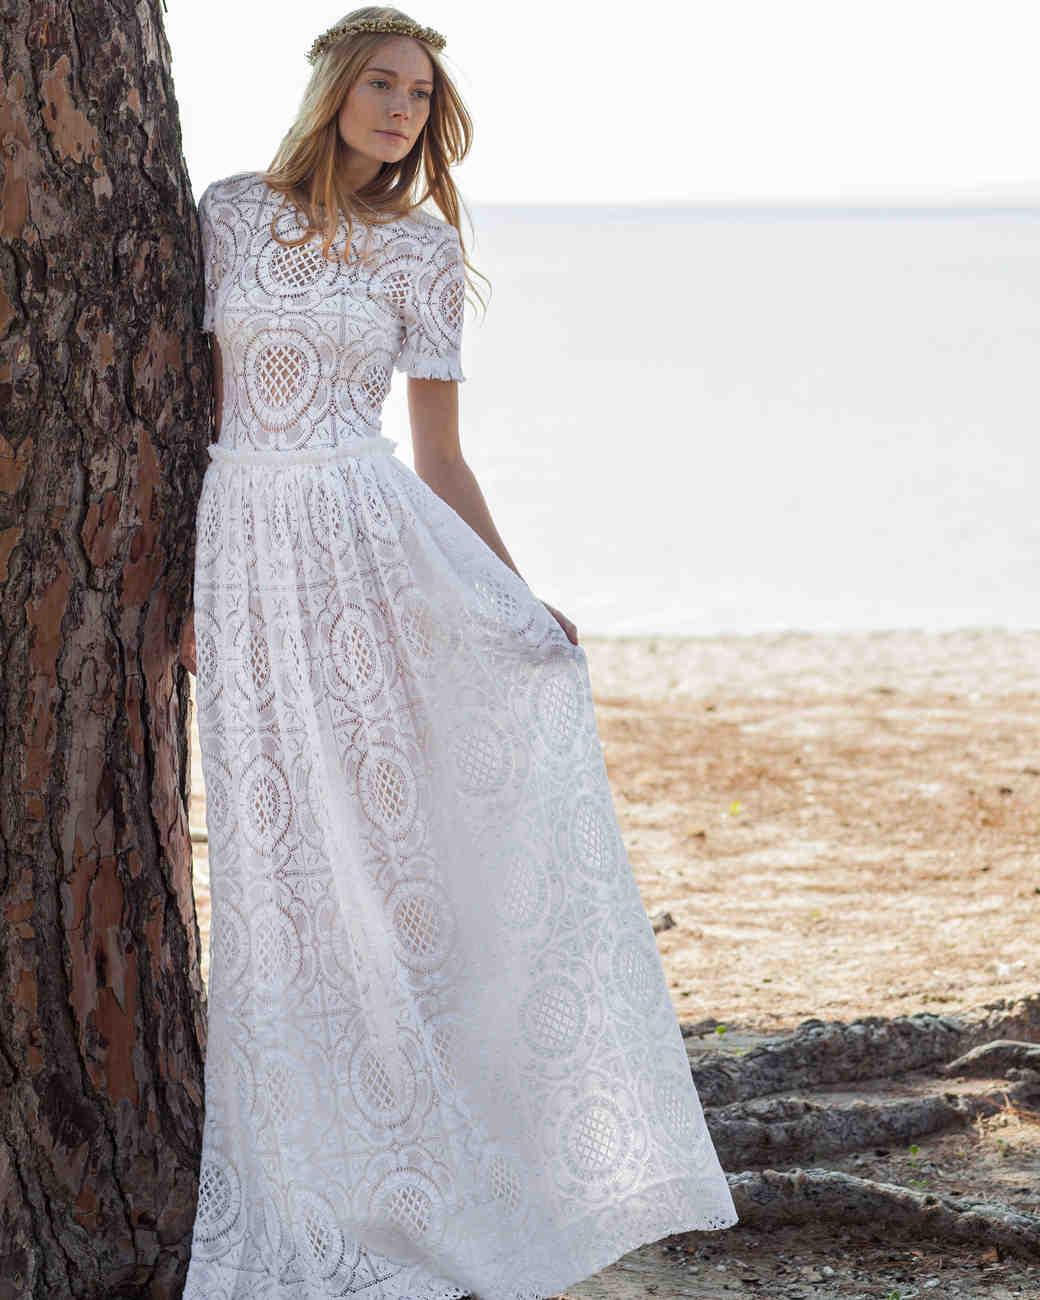 costarellos-fall2016-wedding-dress-16-11.jpg